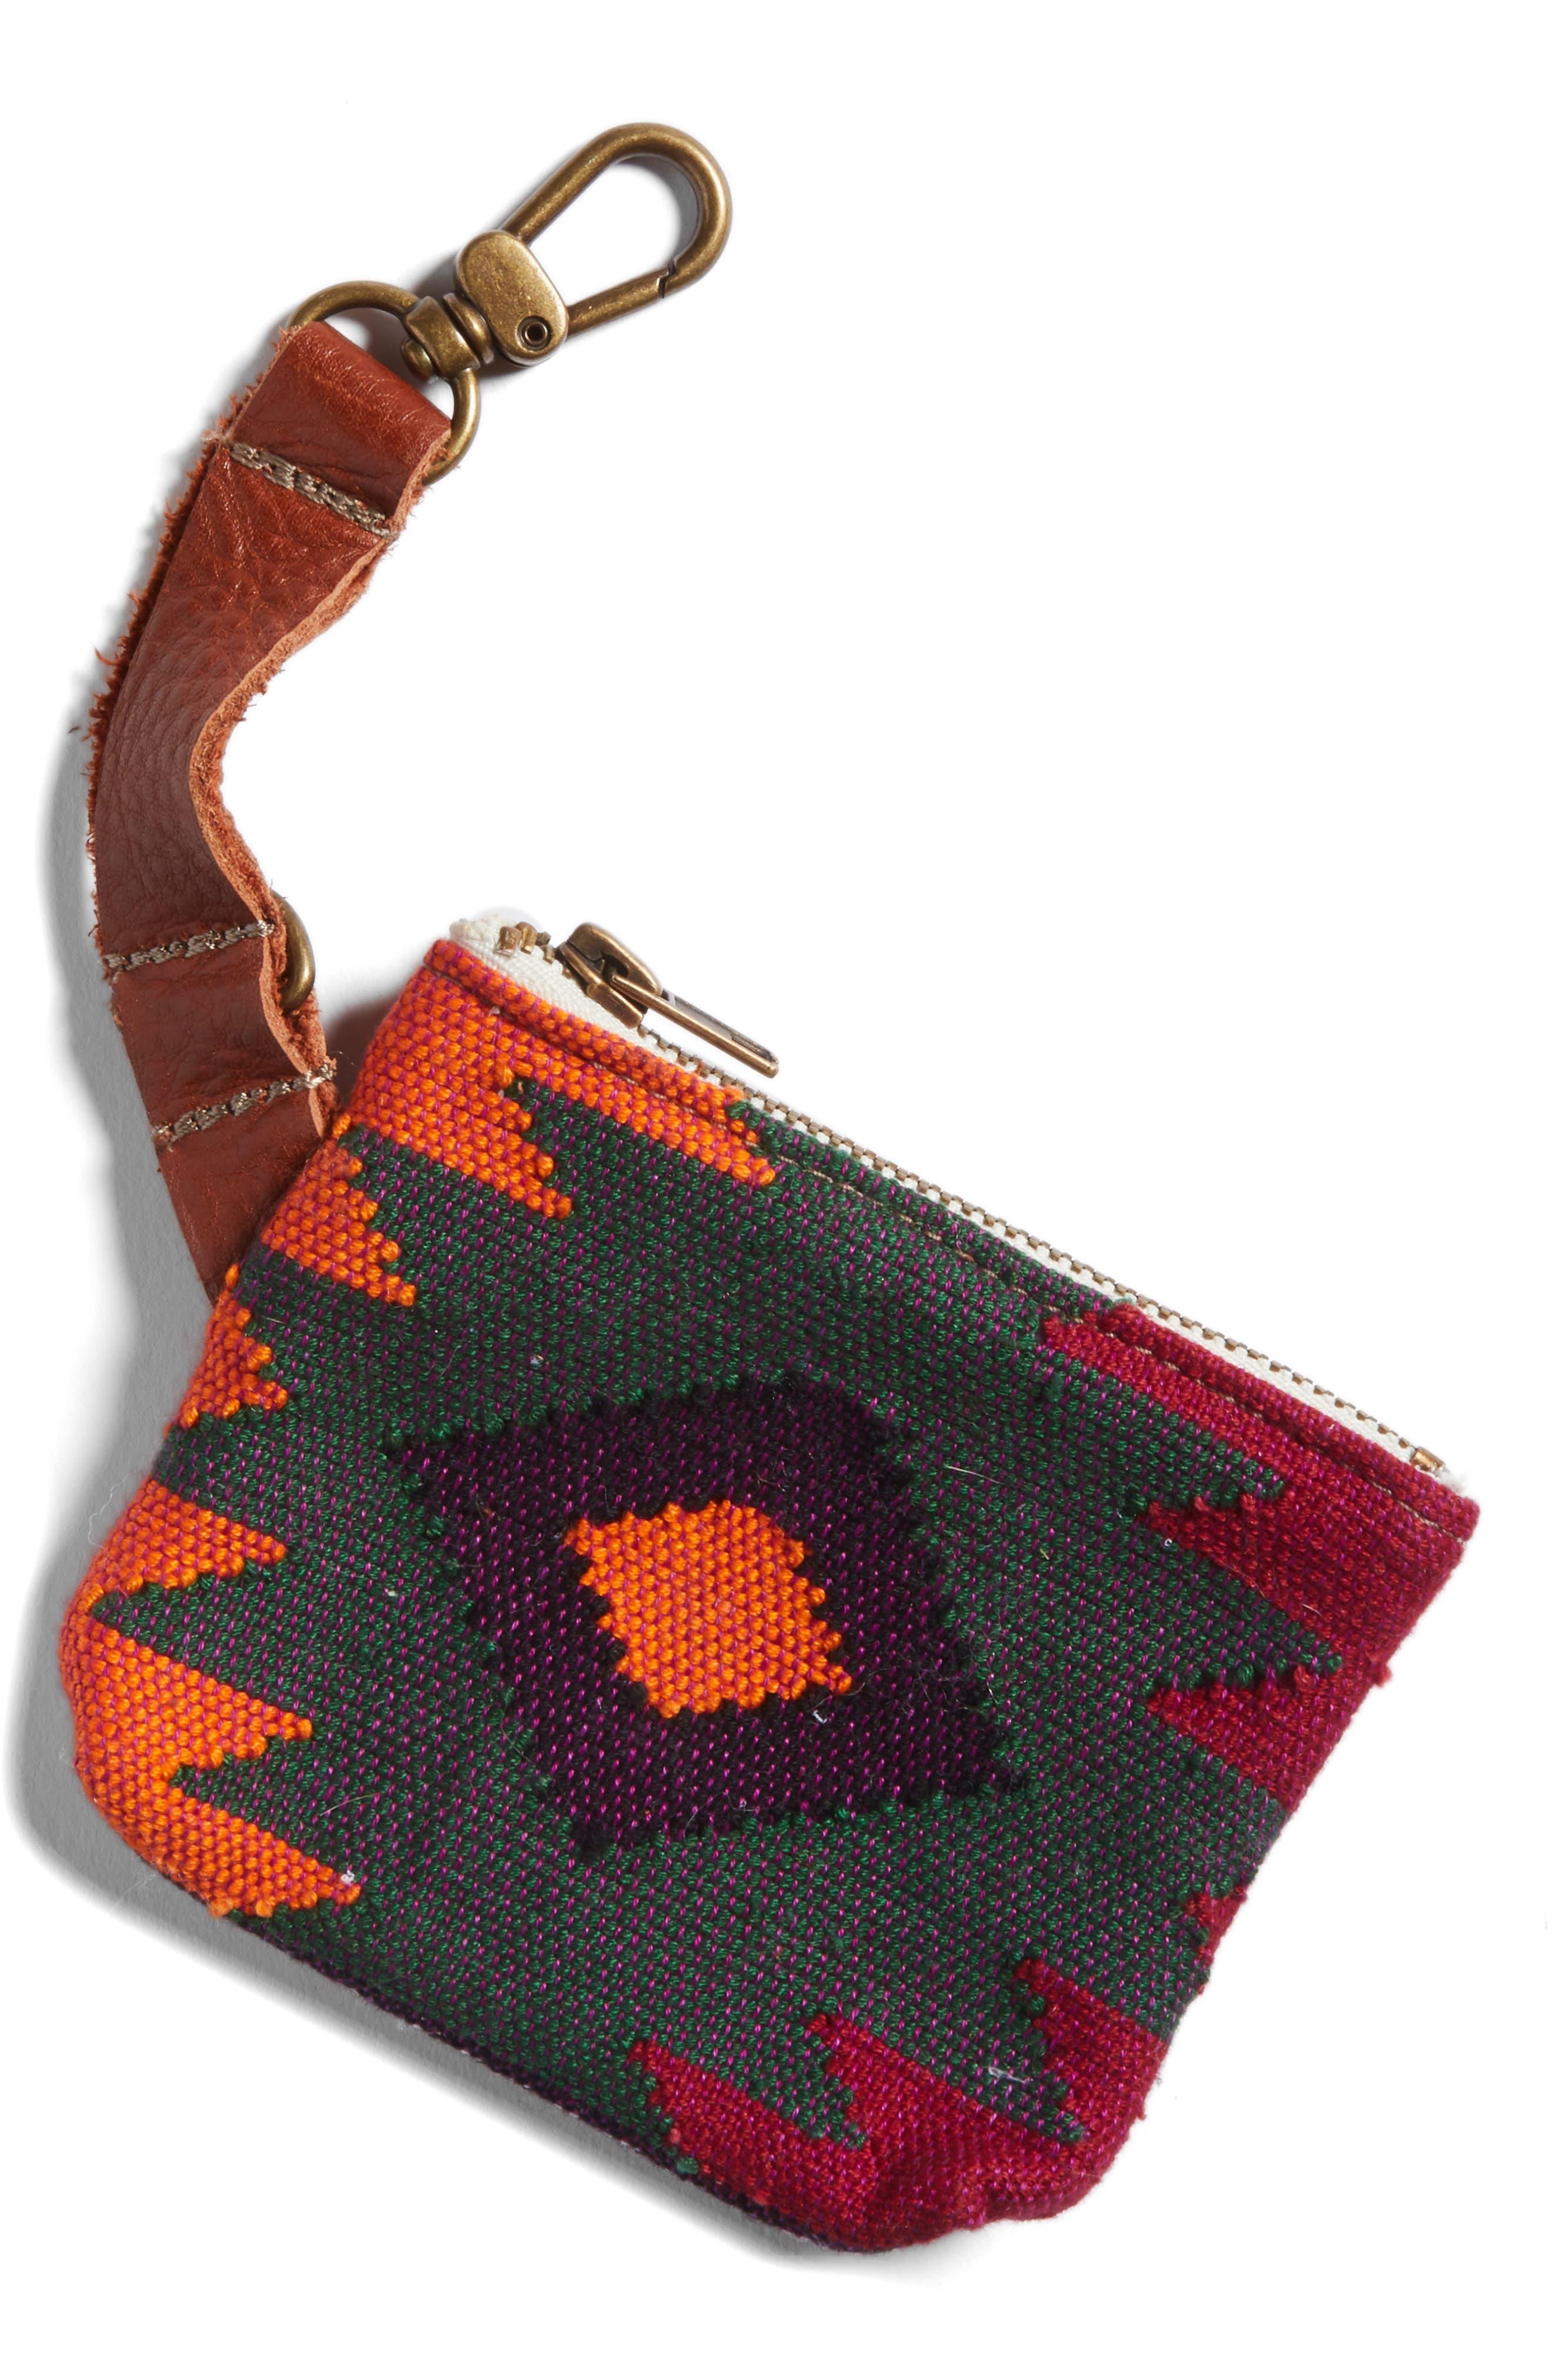 Oaxaca Sunburst Waste Bag Pouch,                             Main thumbnail 1, color,